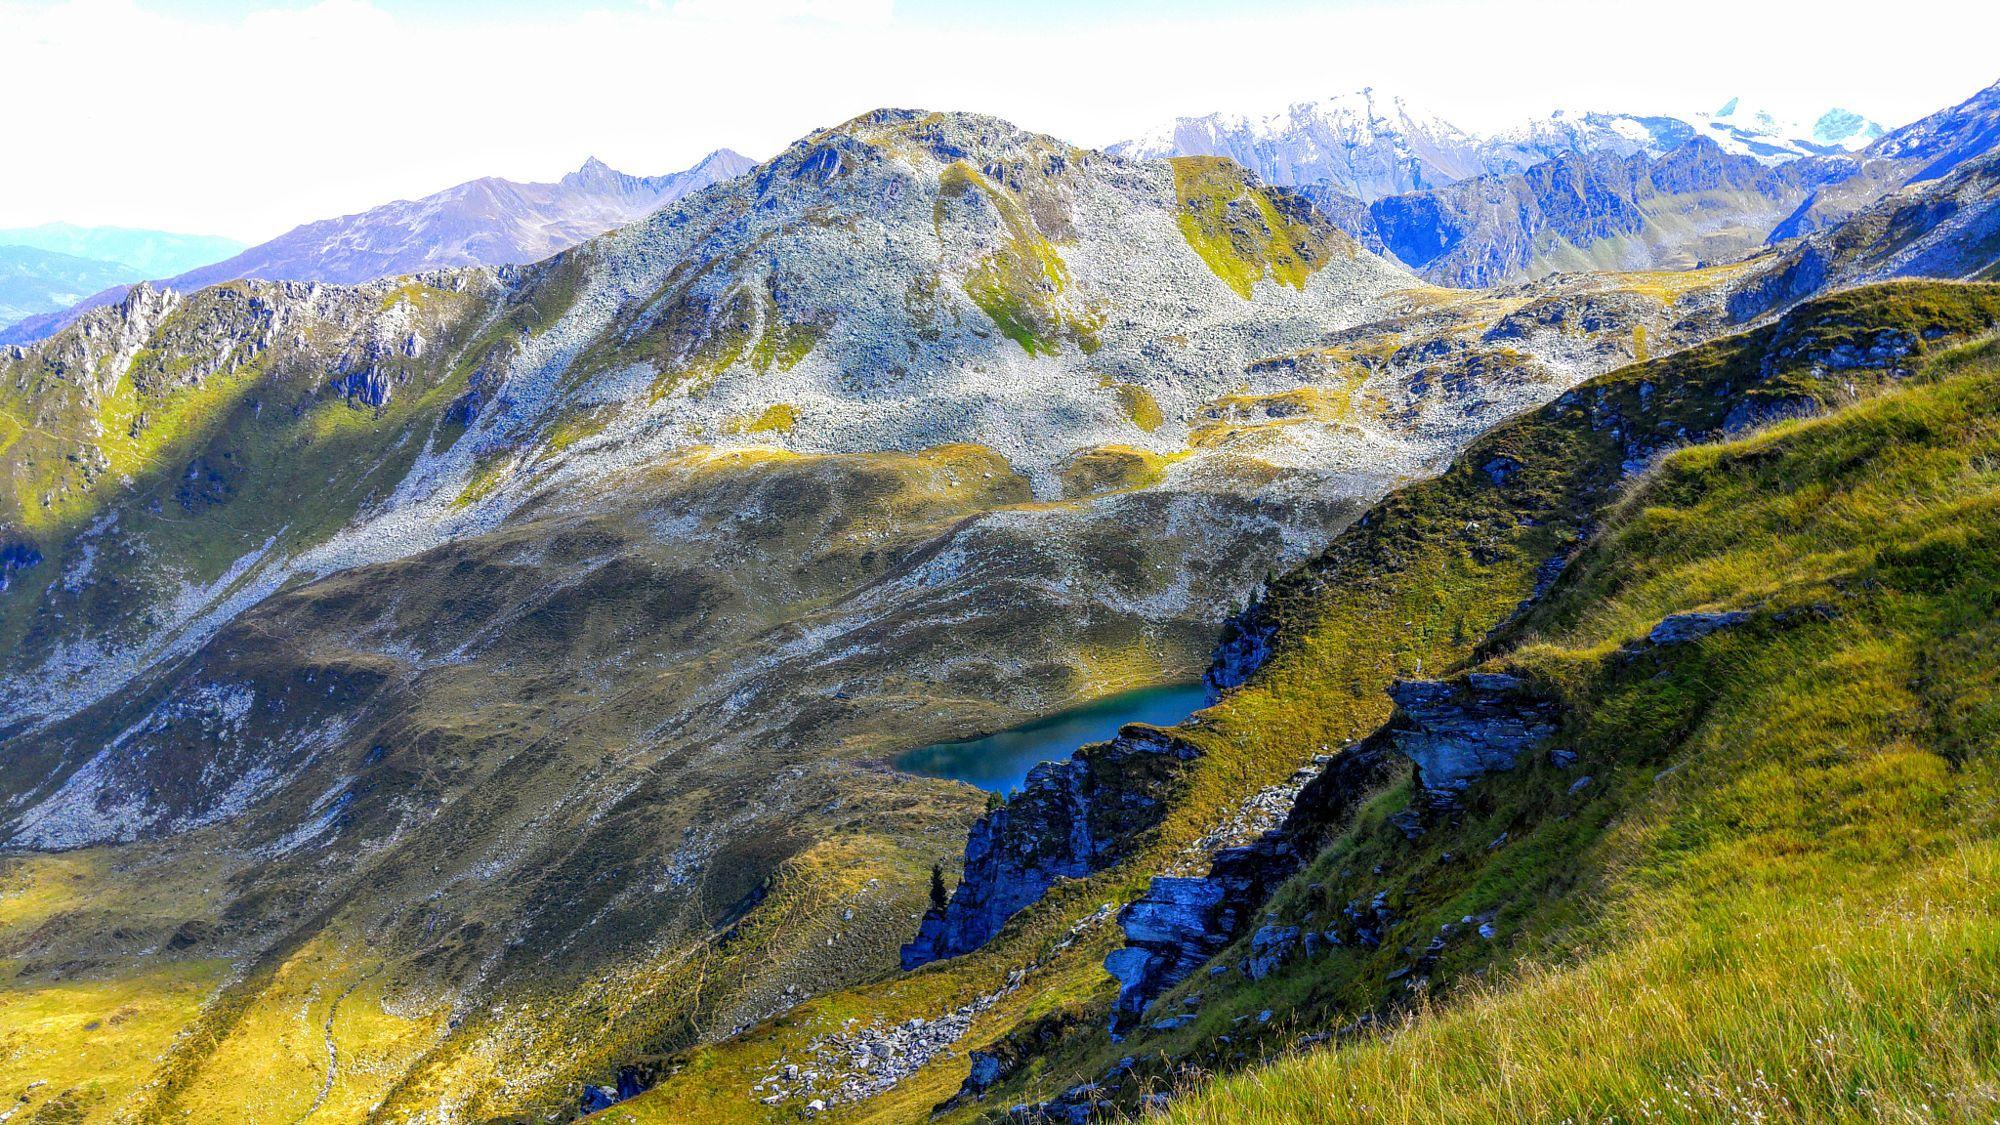 Throwback @ Salzburg  Landscapes photo by Mohamed_Antar http://rarme.com/?F9gZi